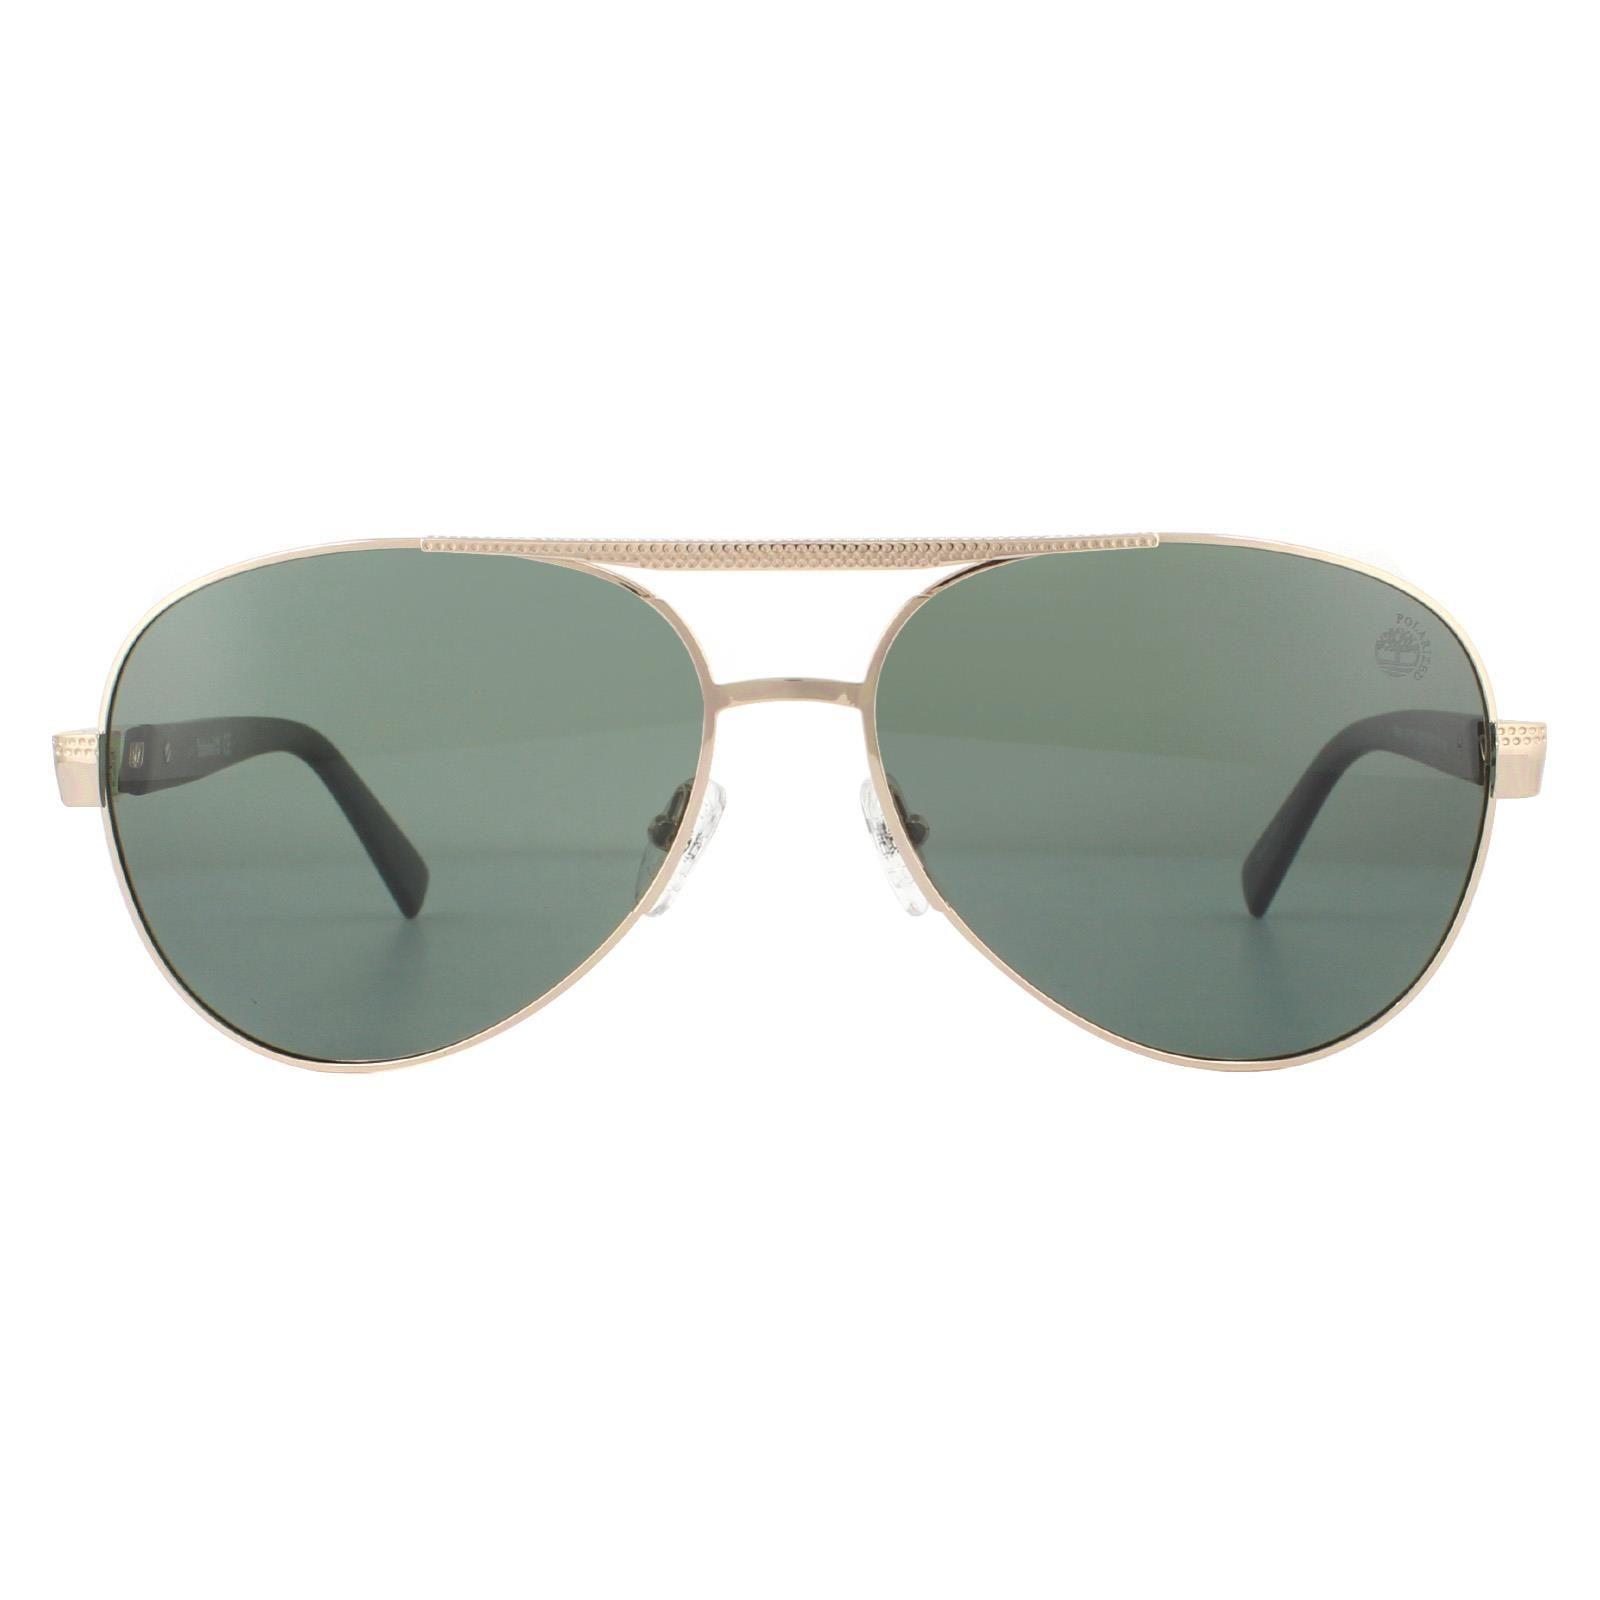 Timberland Sunglasses TB9214 32R Gold Green Polarized